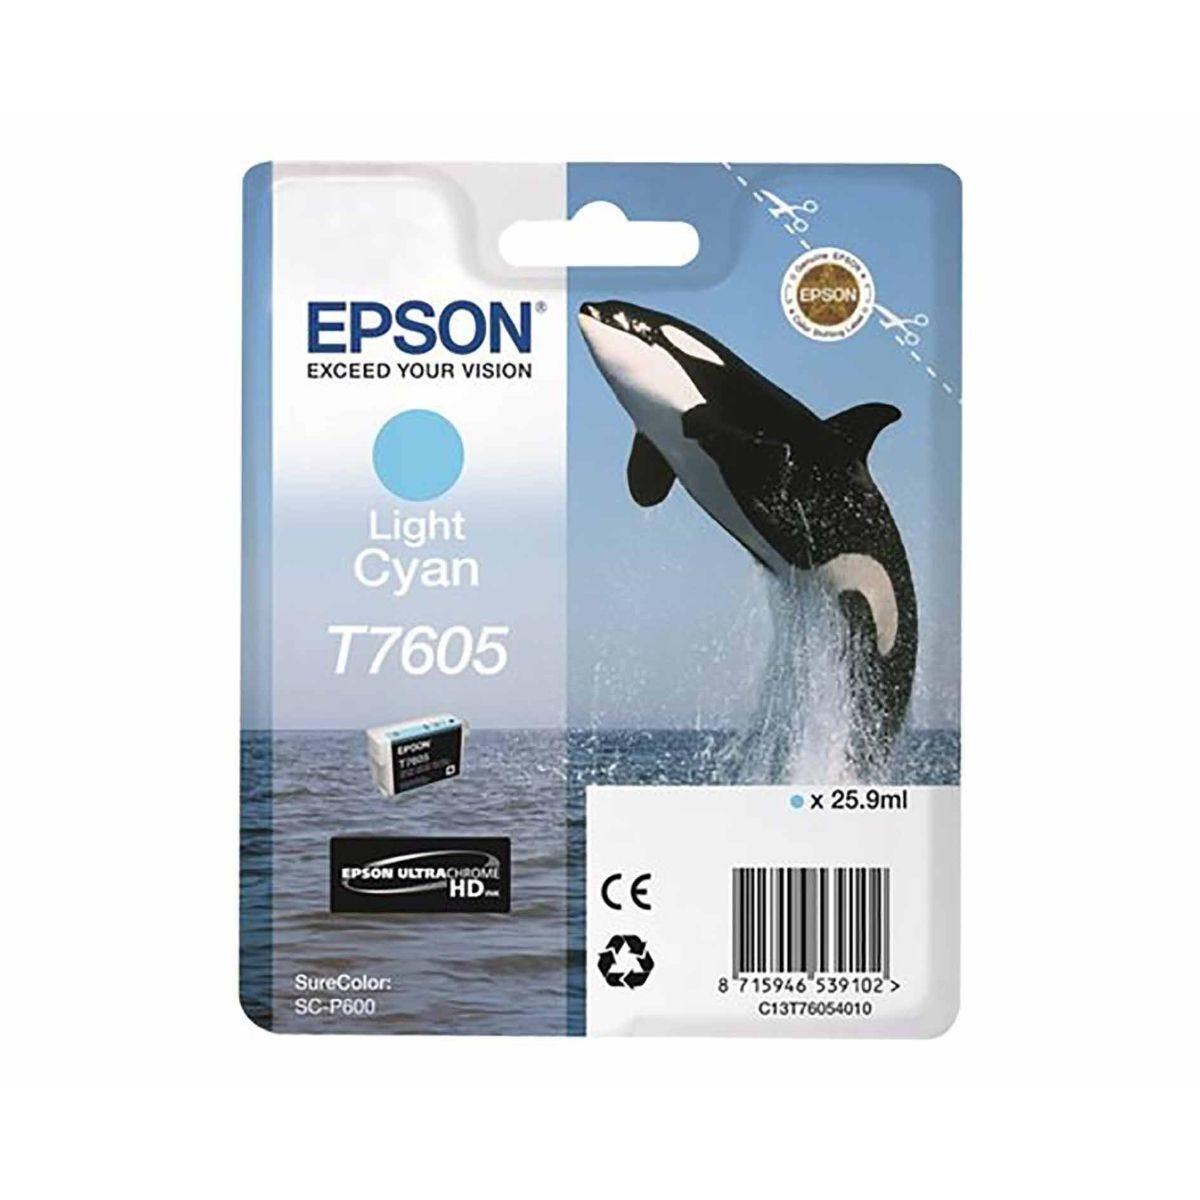 Epson T7605 Ink Light Cyan